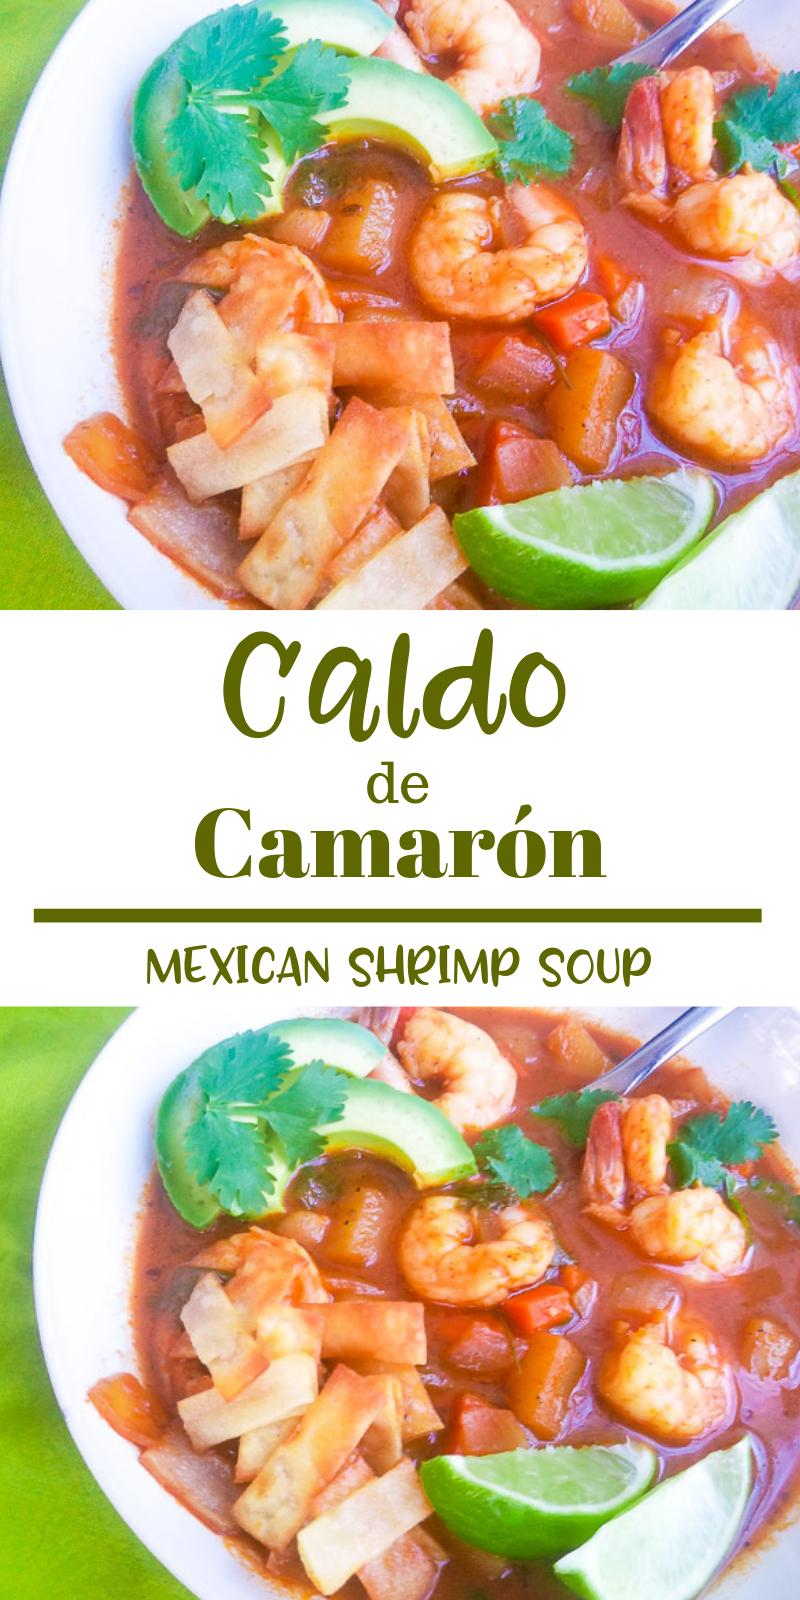 Caldo de Camarón (Mexican Shrimp Soup) #mexicanshrimprecipes